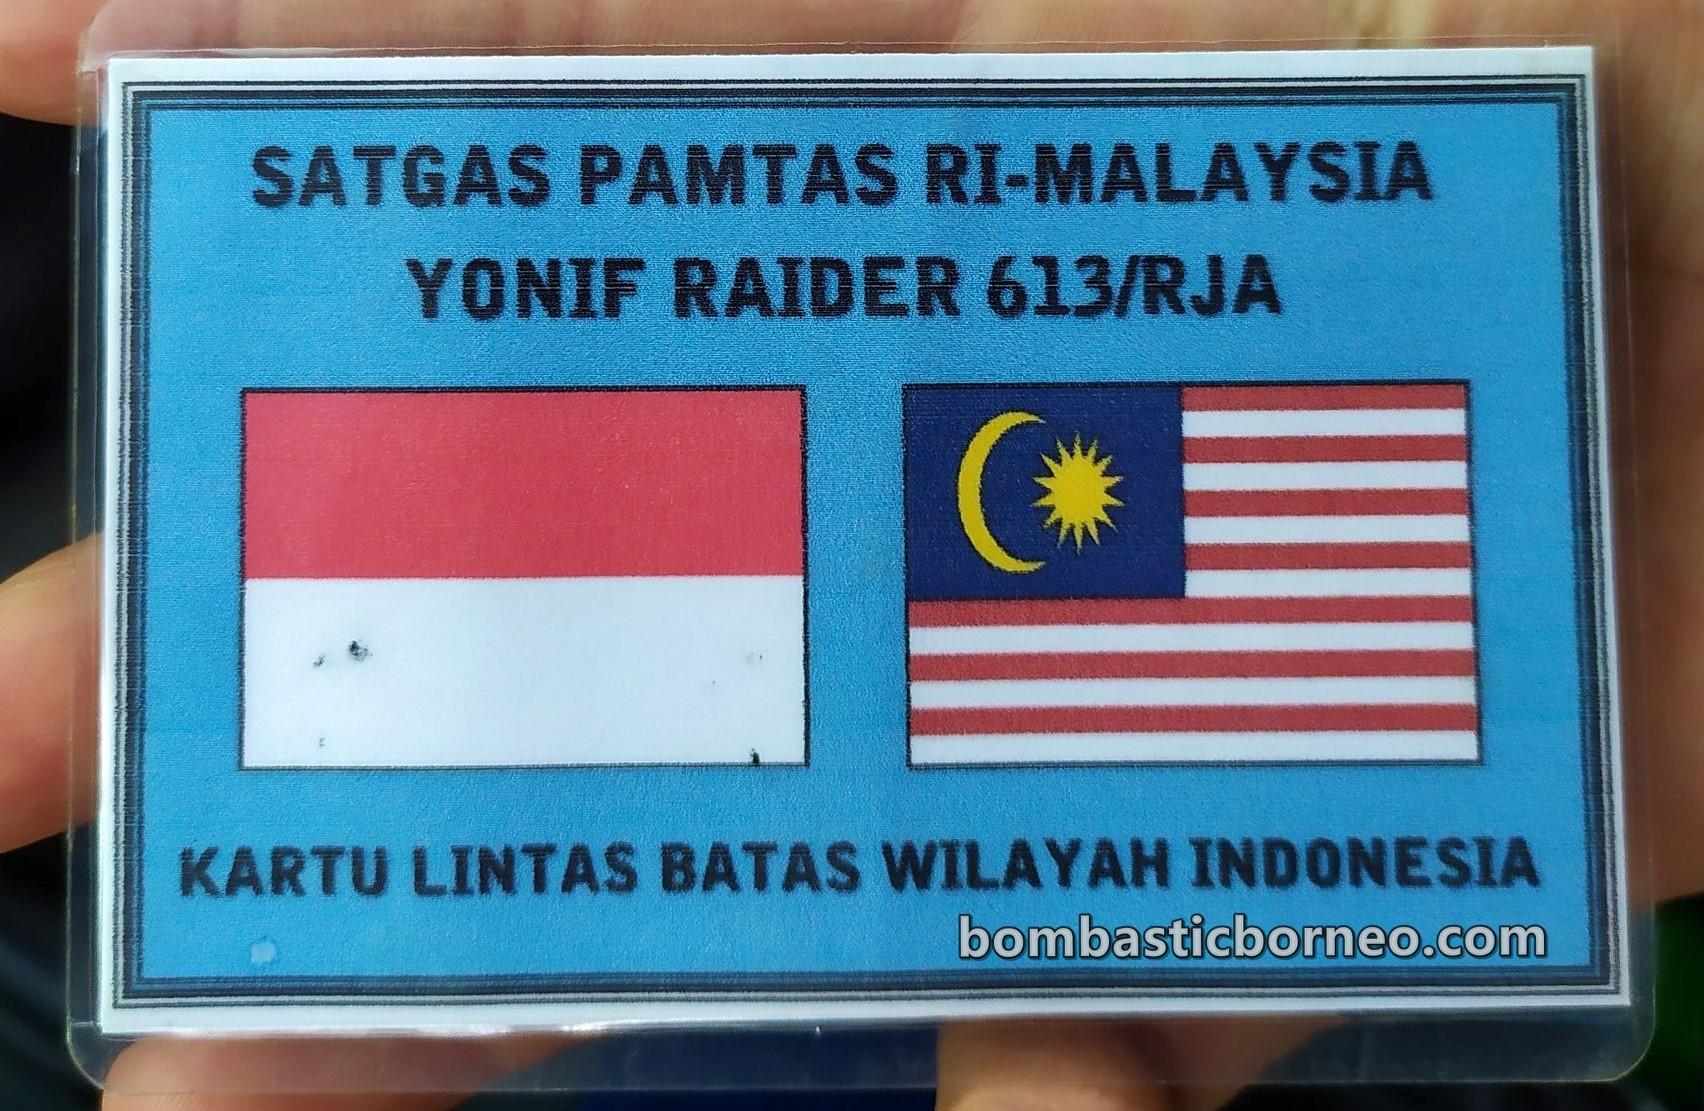 Border Pas, Pos Imigresen Malaysia, Immigration checkpoint, Indonesia, North Kalimantan, Krayan, Sarawak, Malaysia, adventure, backpackers, exploration, Cross Border, 跨境婆罗洲游踪, 马来西亚砂拉越, 印尼北加里曼丹,